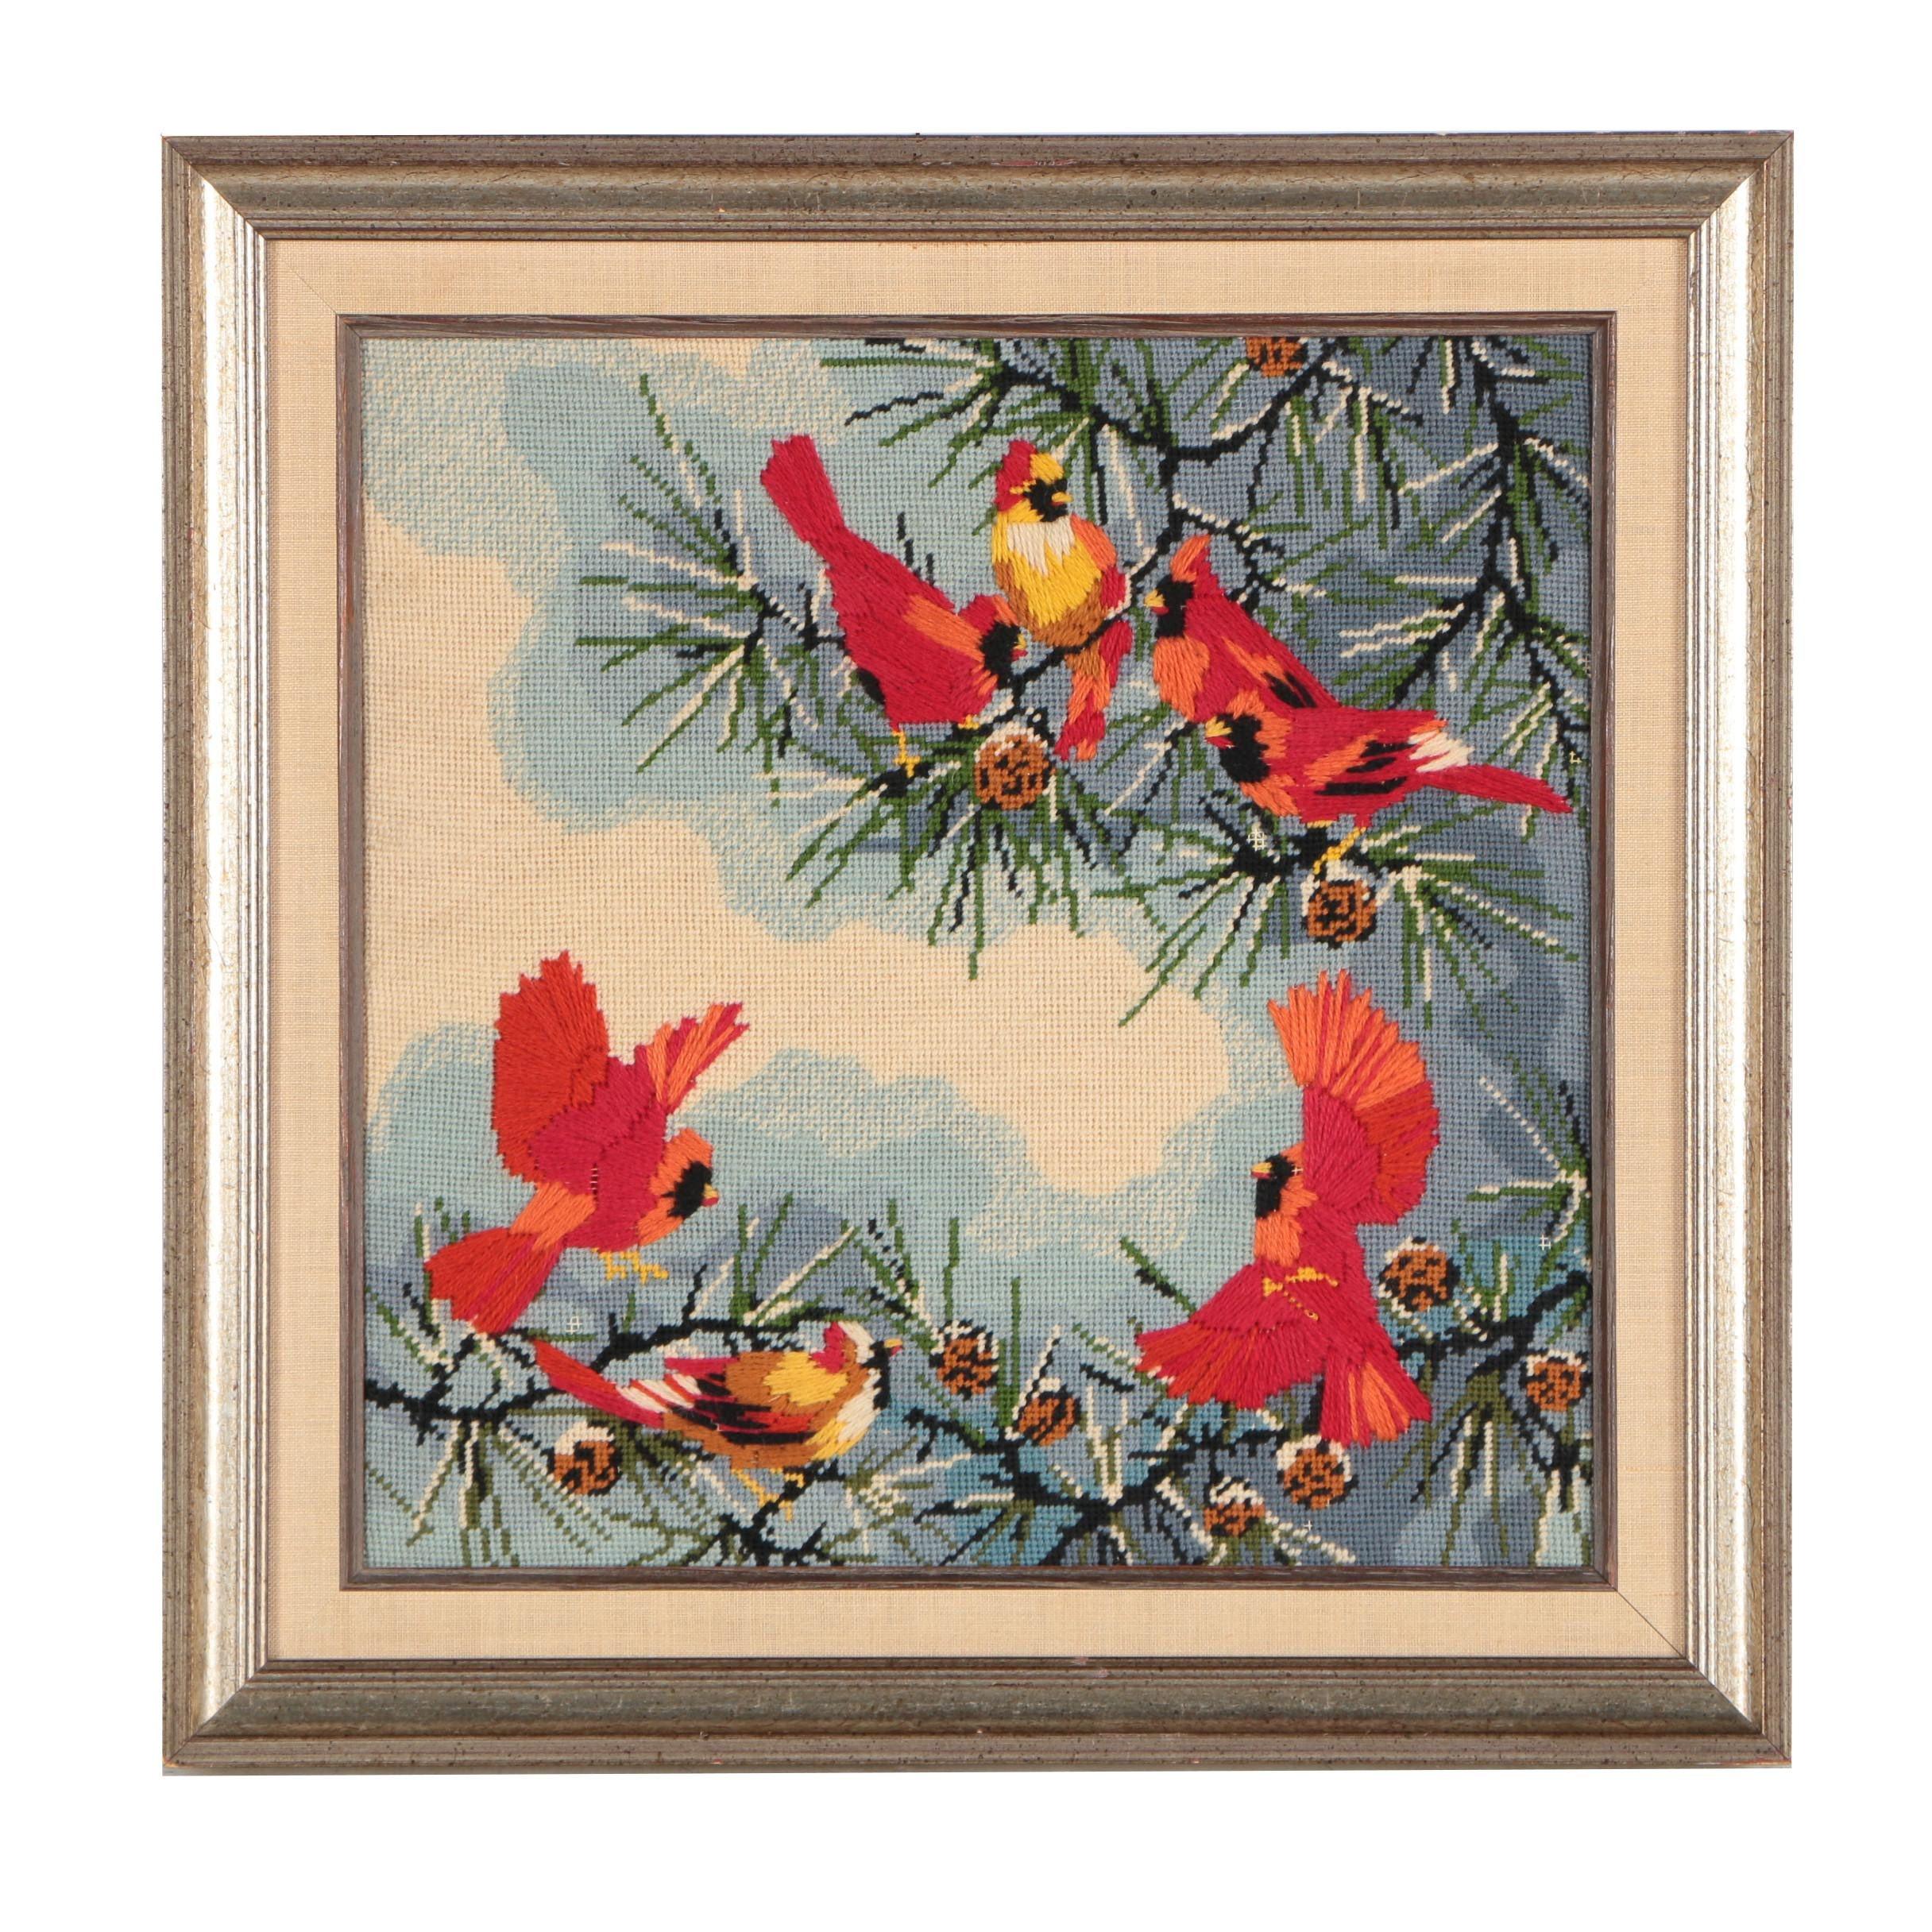 Framed Needlepoint of Cardinals